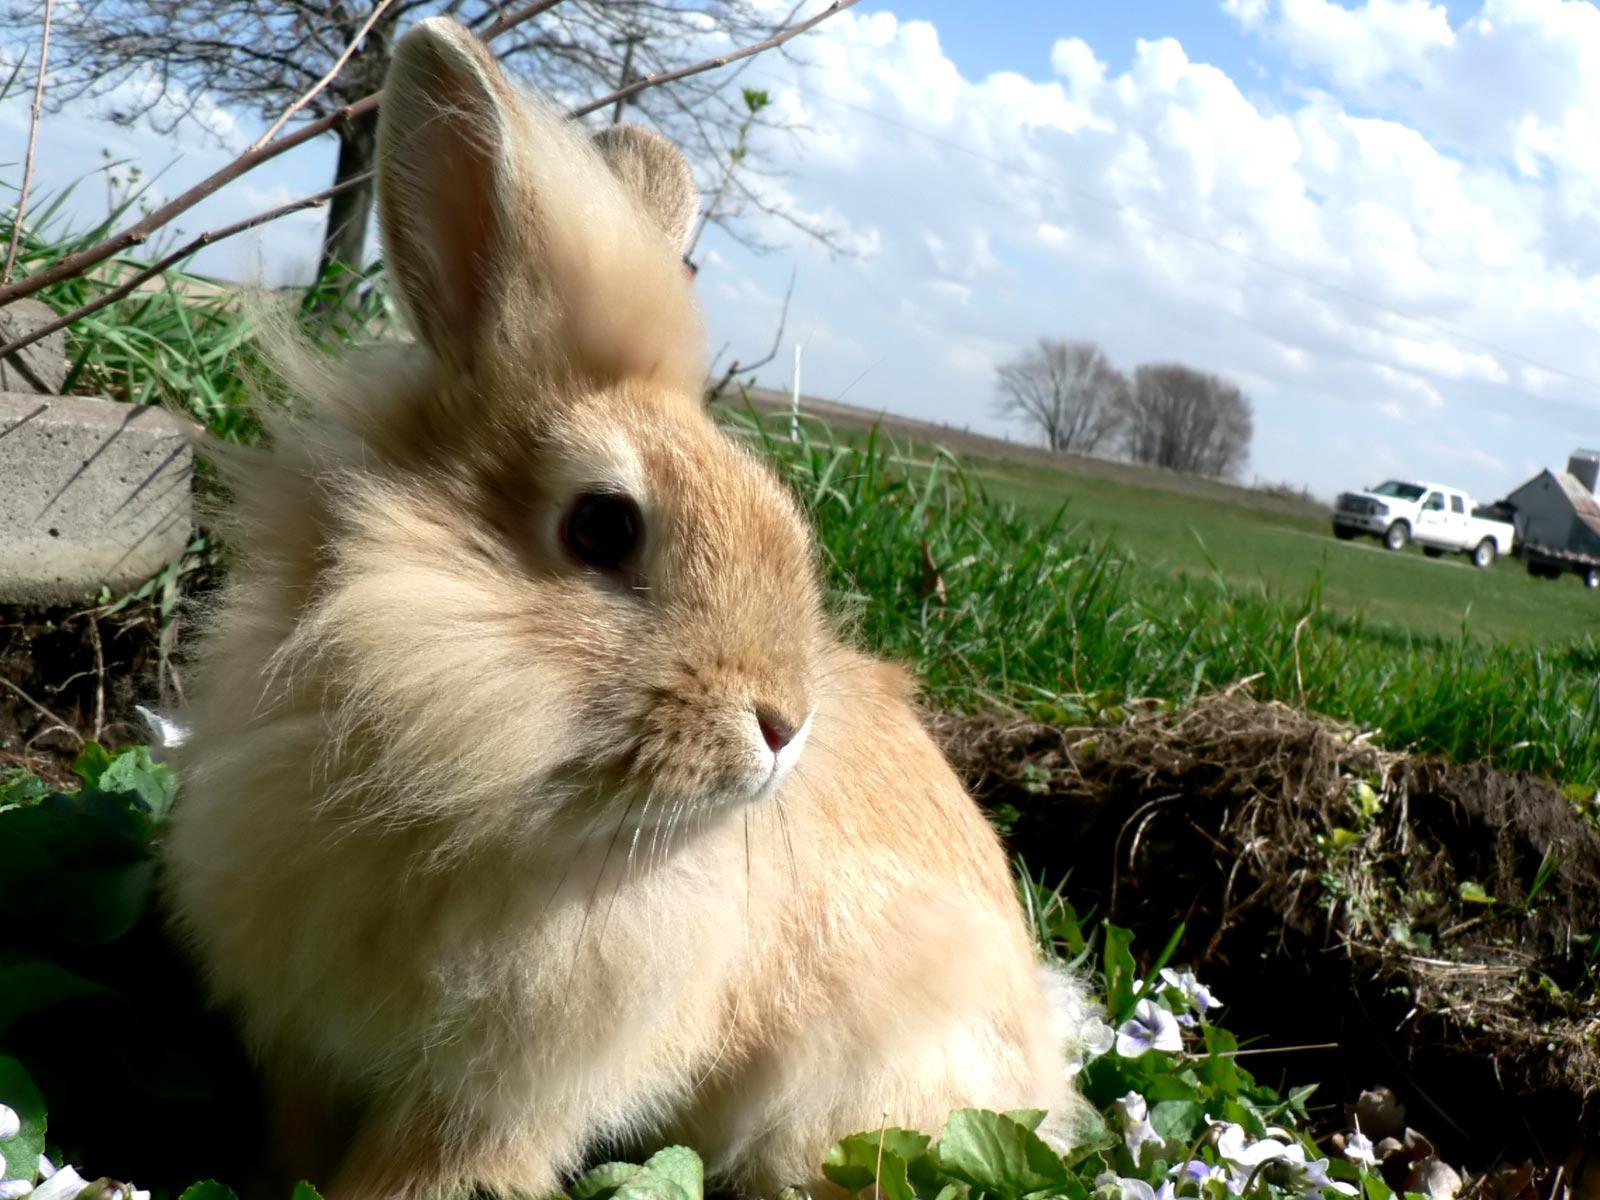 Best And Cute Hd Wallpapers Hd Animals Rabbit Wallpaper Hd